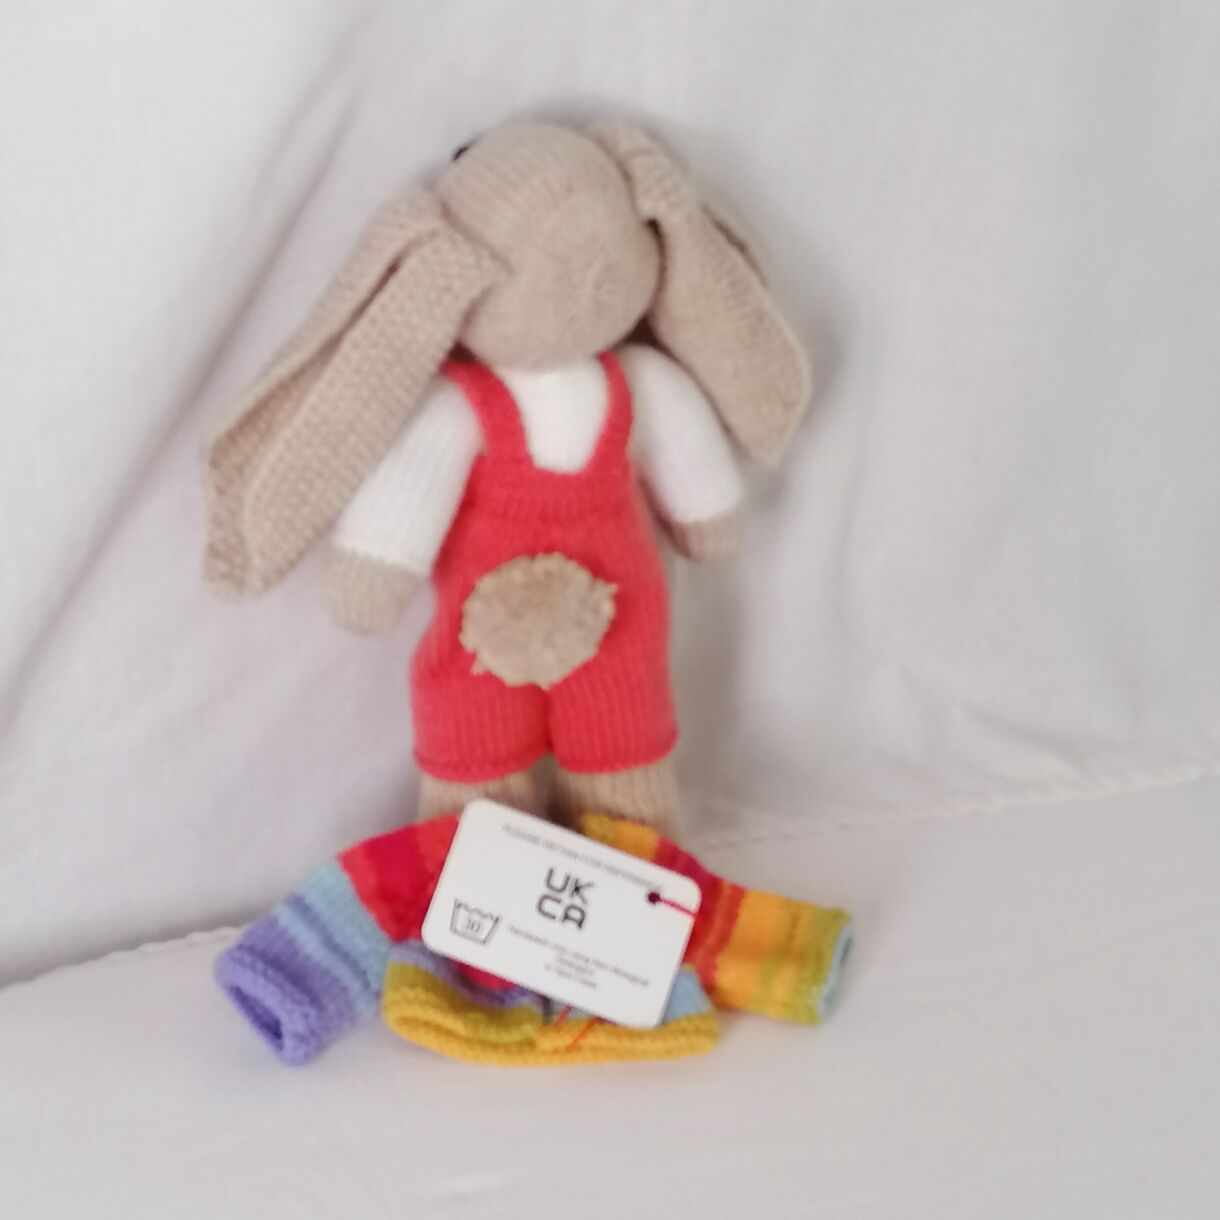 handknitted-rainbow-bunny-unique-gift-orange-back-no-jacket